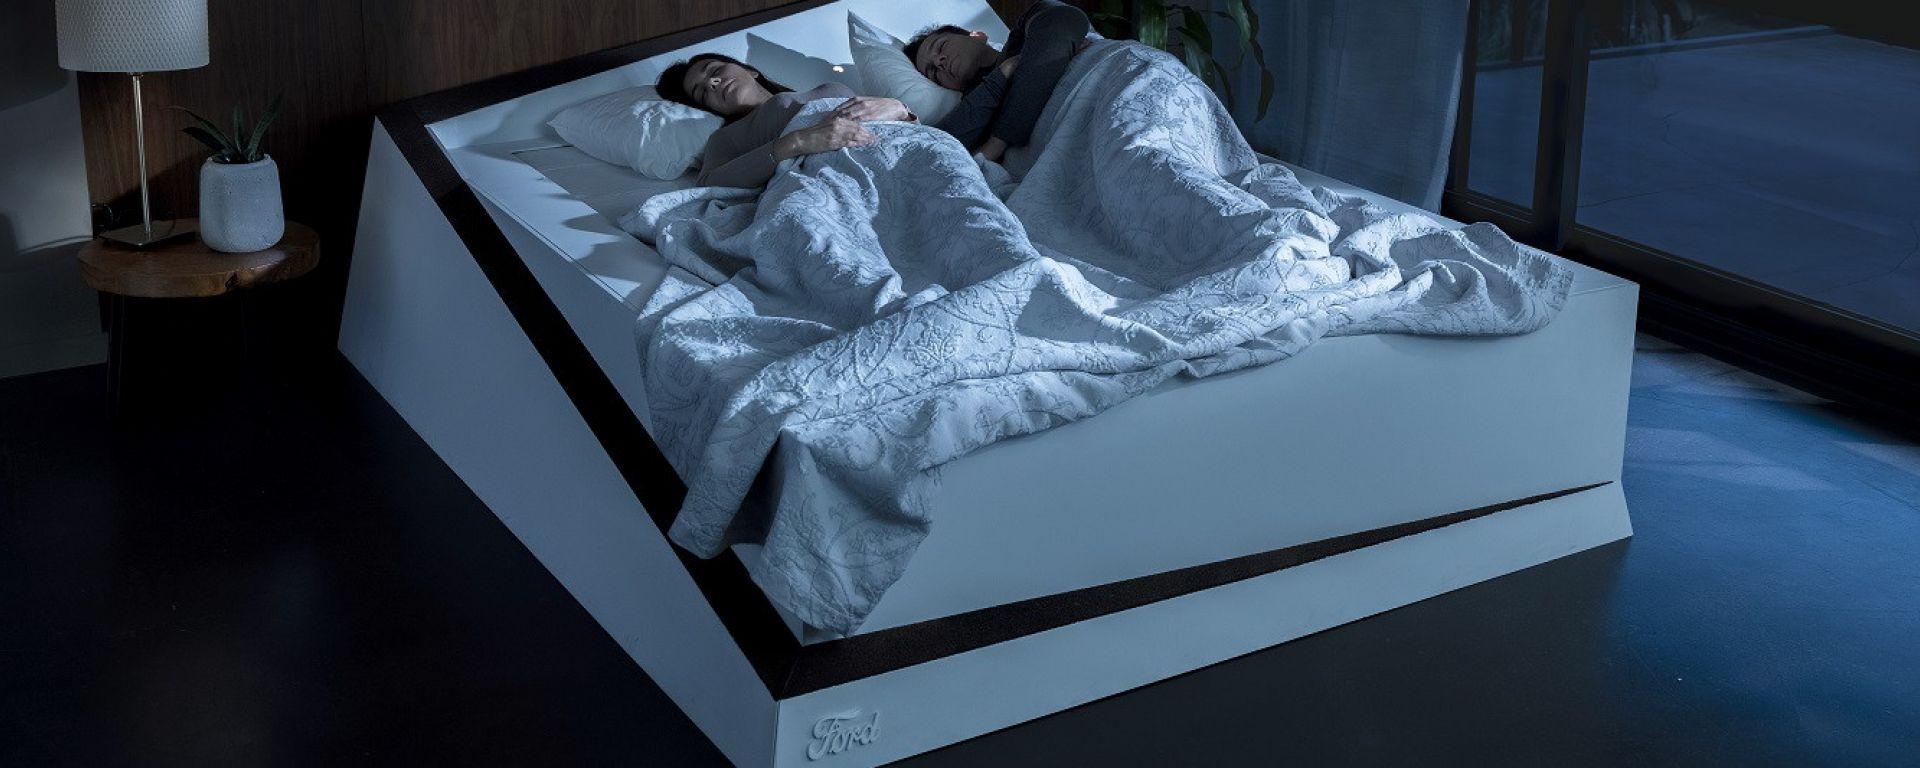 Ford Lane keeping bed, a prova di